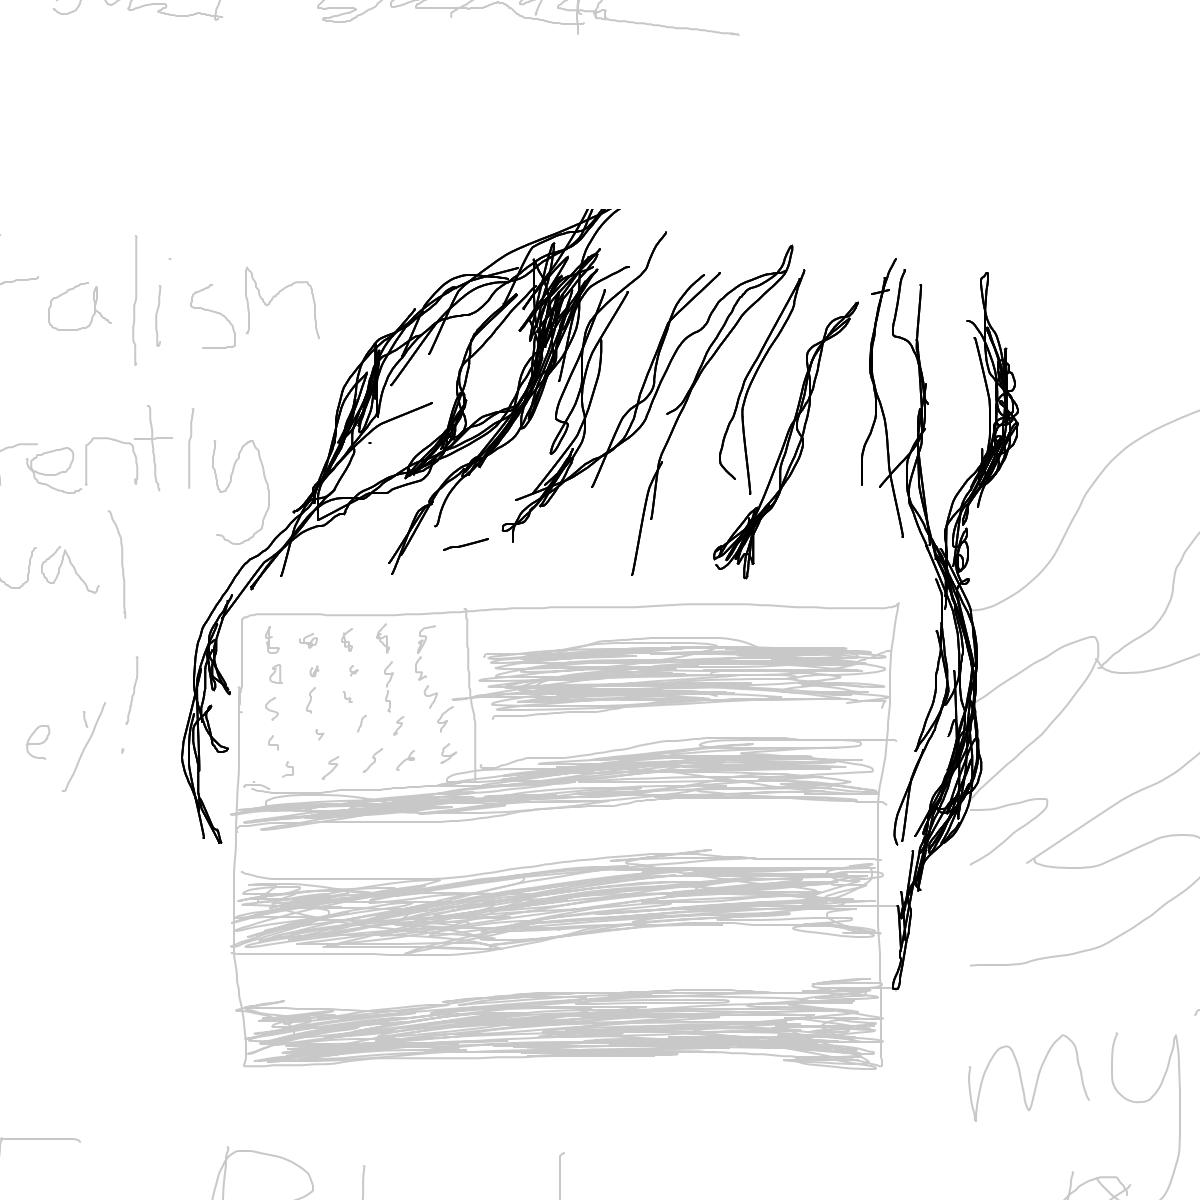 BAAAM drawing#6012 lat:51.5067977905273440lng: -0.1636517196893692